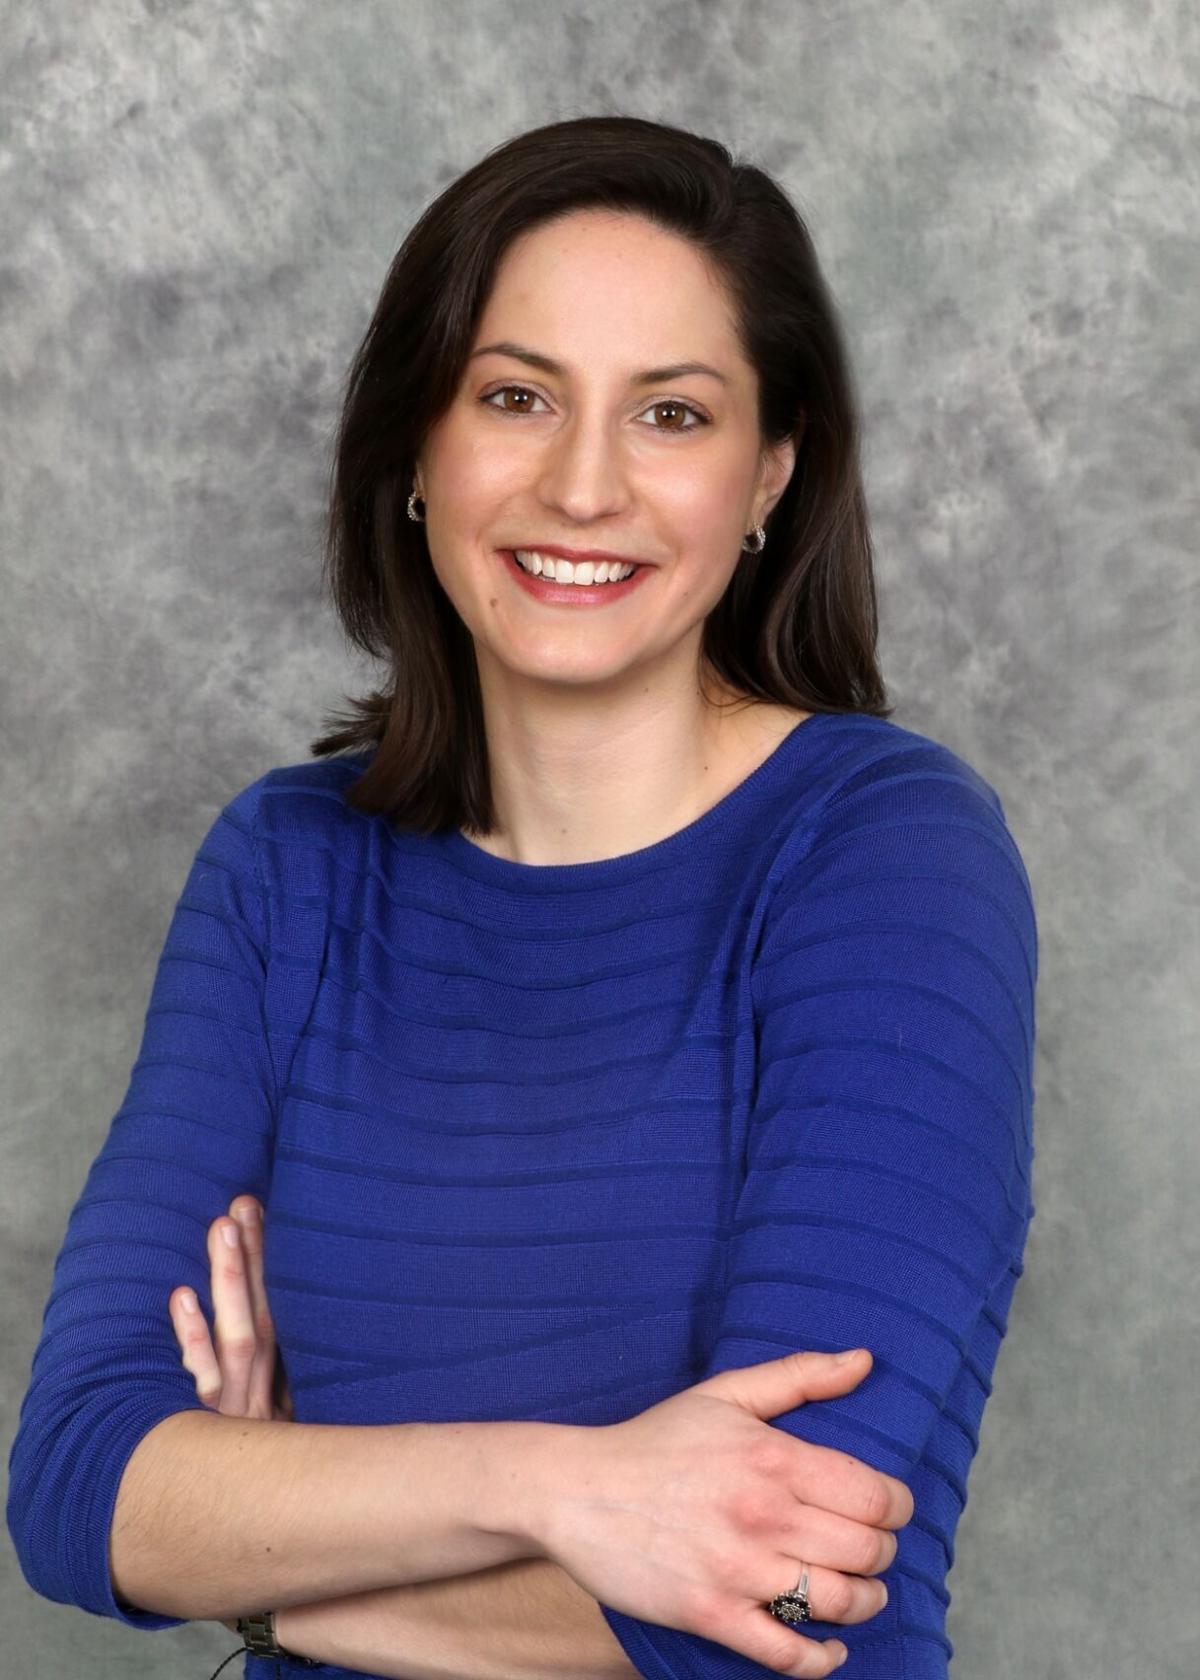 Sarah Tanbakuchi